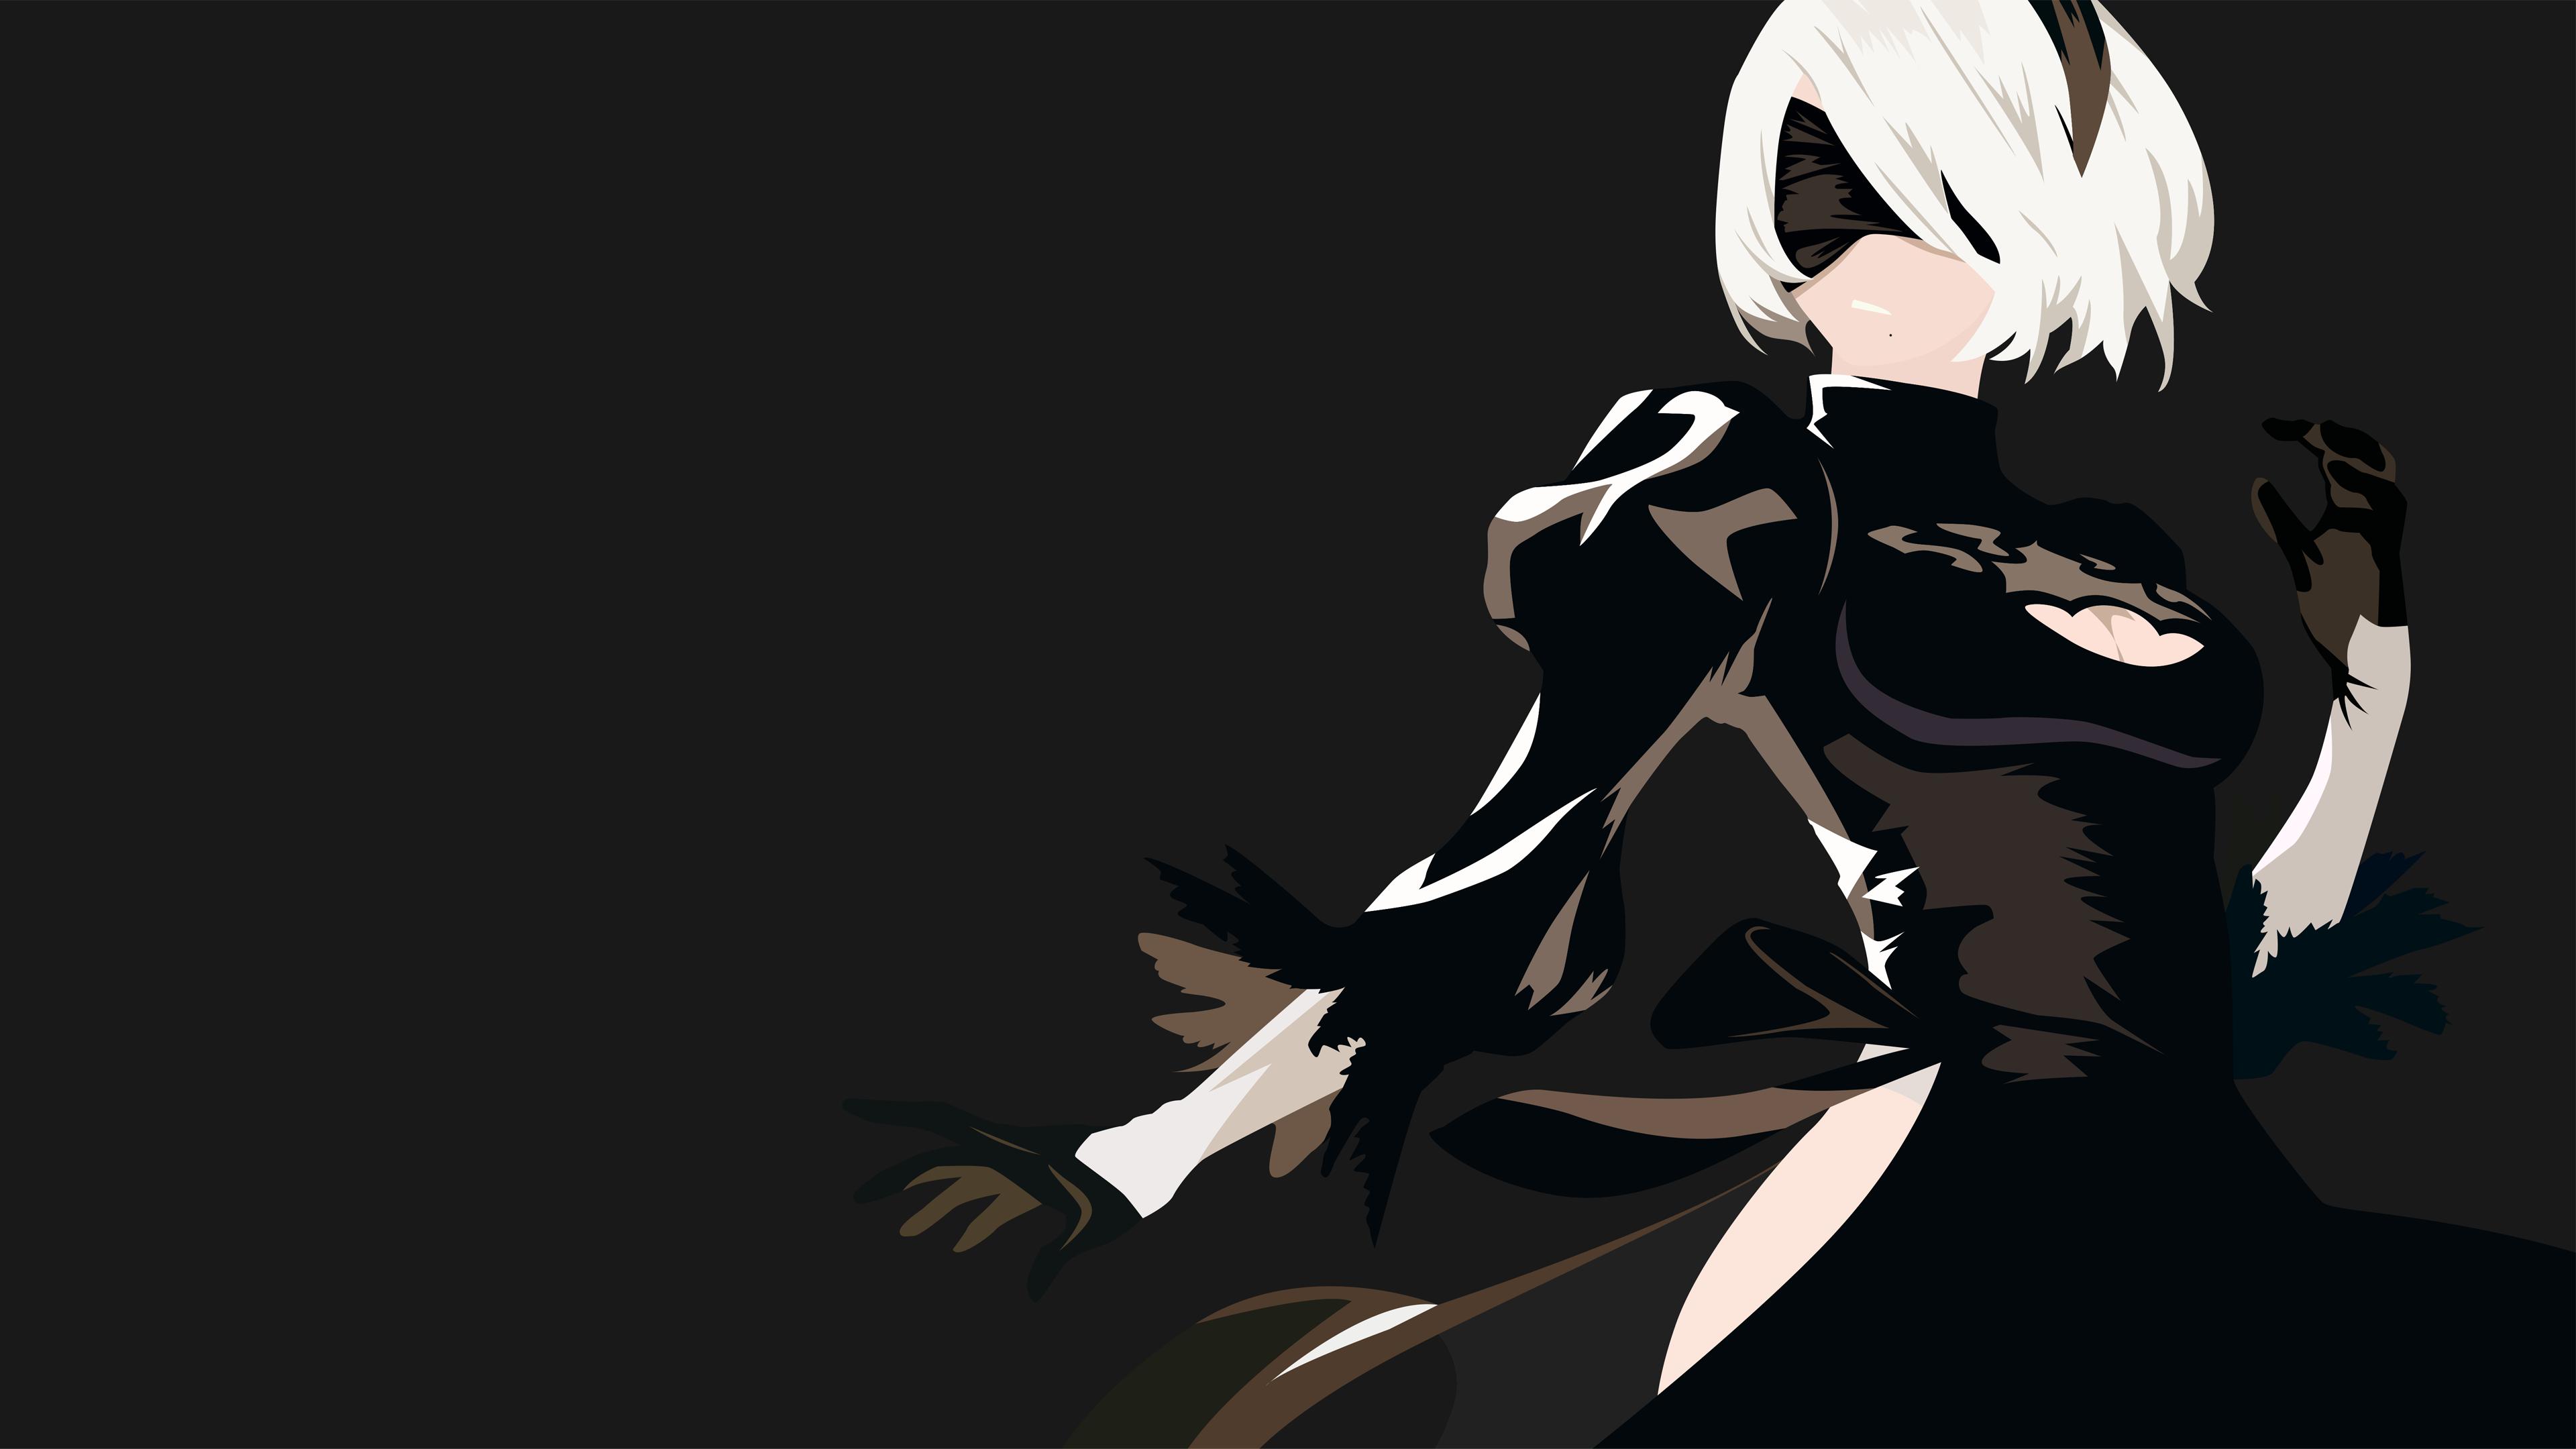 Anime 3840x2160 Nier: Automata 2B (Nier: Automata) minimalism simple background NieR